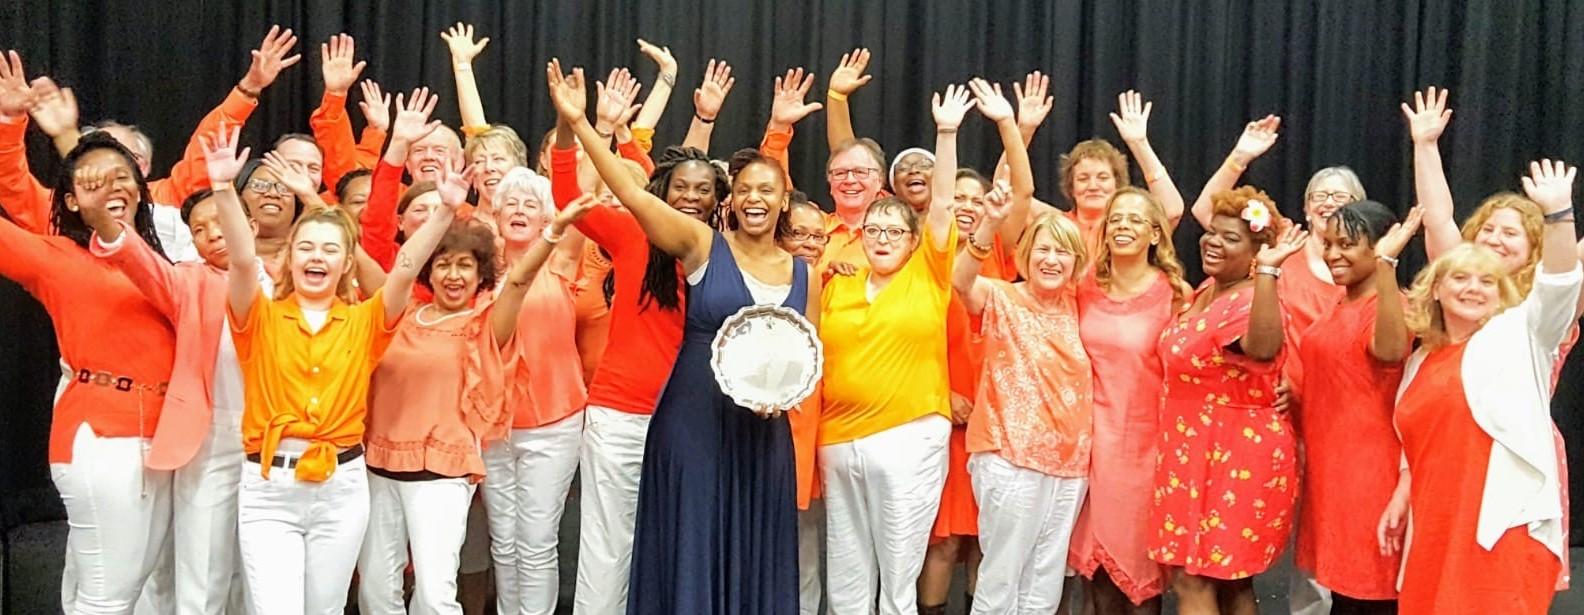 Soul Symphony Choir 2 cropped wins at CPAF 2019.jpg